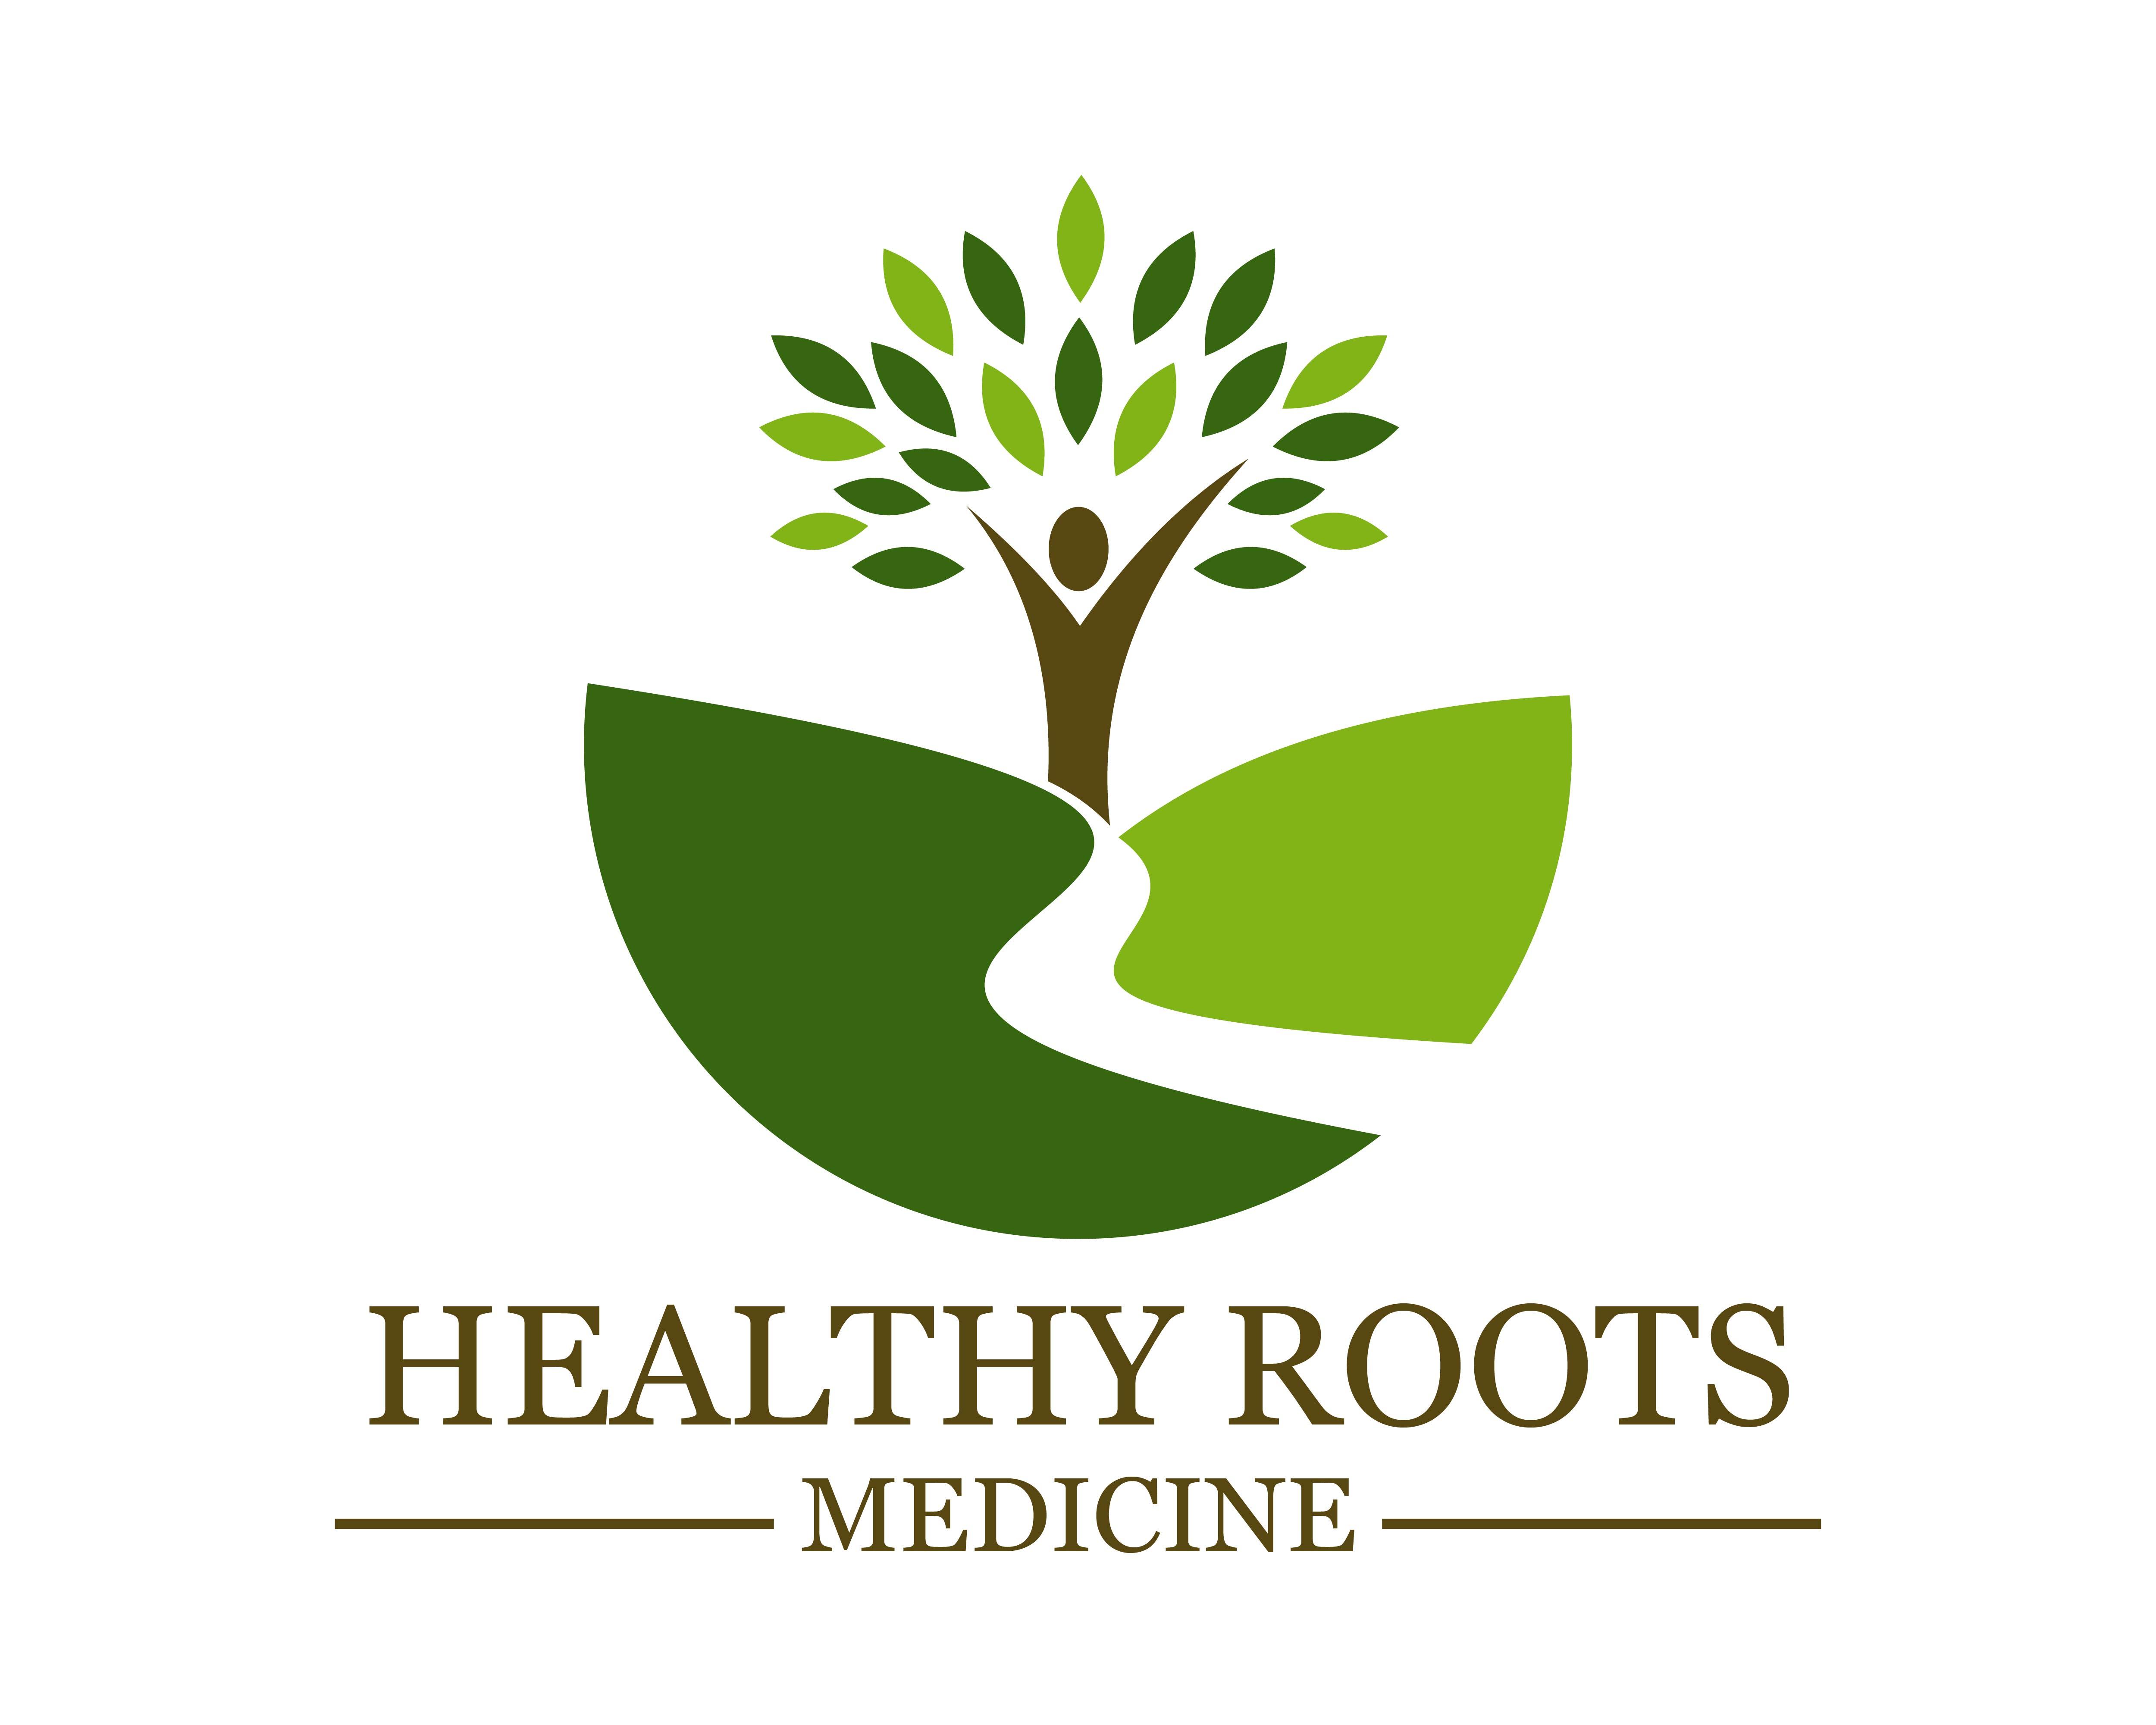 healthyrootsmedicine